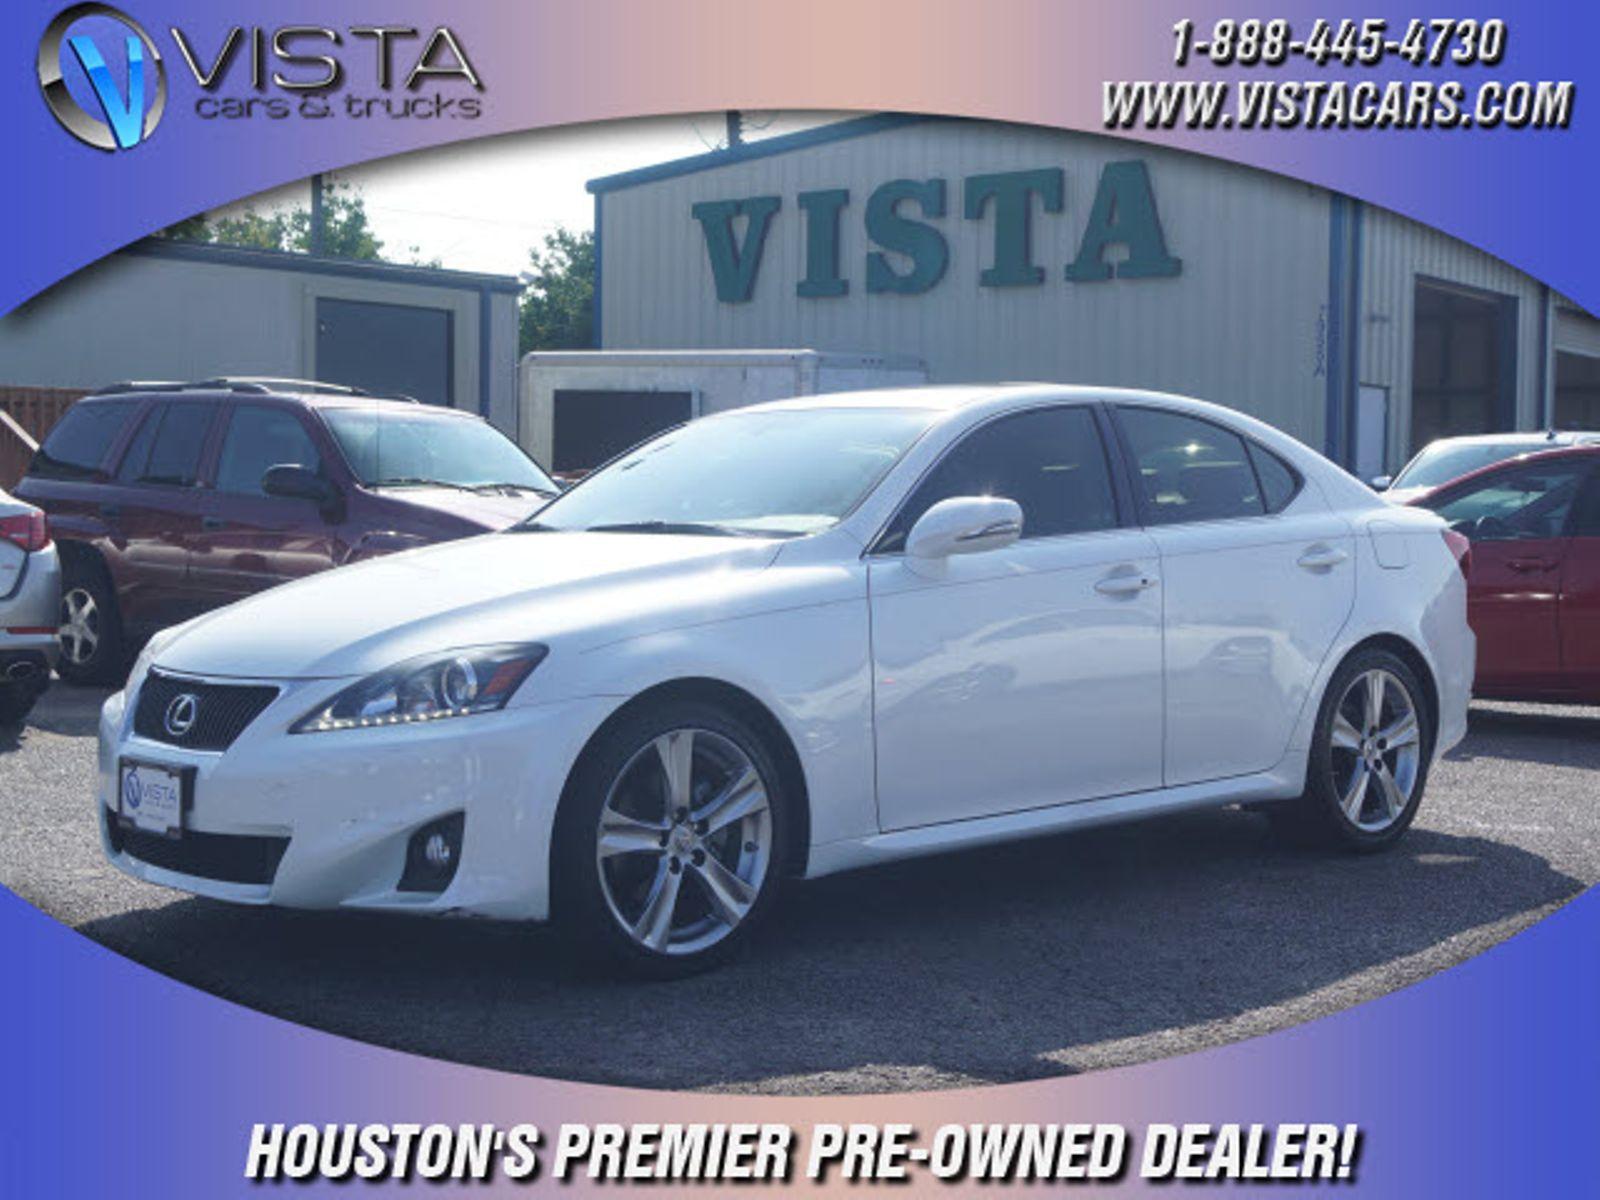 2011 Lexus IS 250 Base city Texas Vista Cars and Trucks